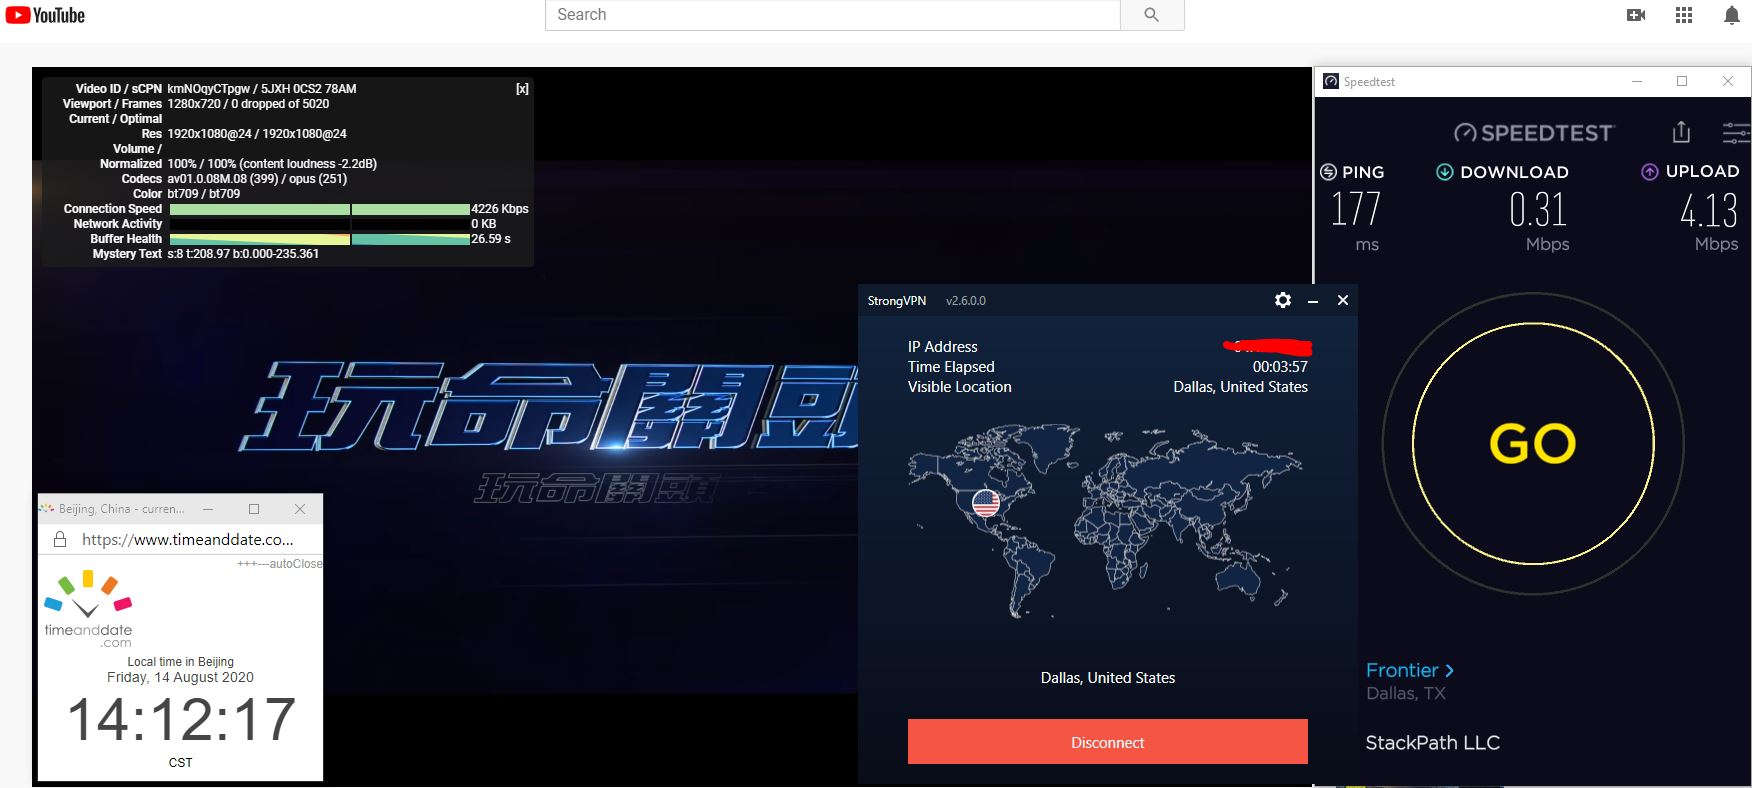 Windows10 StrongVPN IKEv2 USA - Dallas 中国VPN 翻墙 科学上网 翻墙速度测试 - 20200814